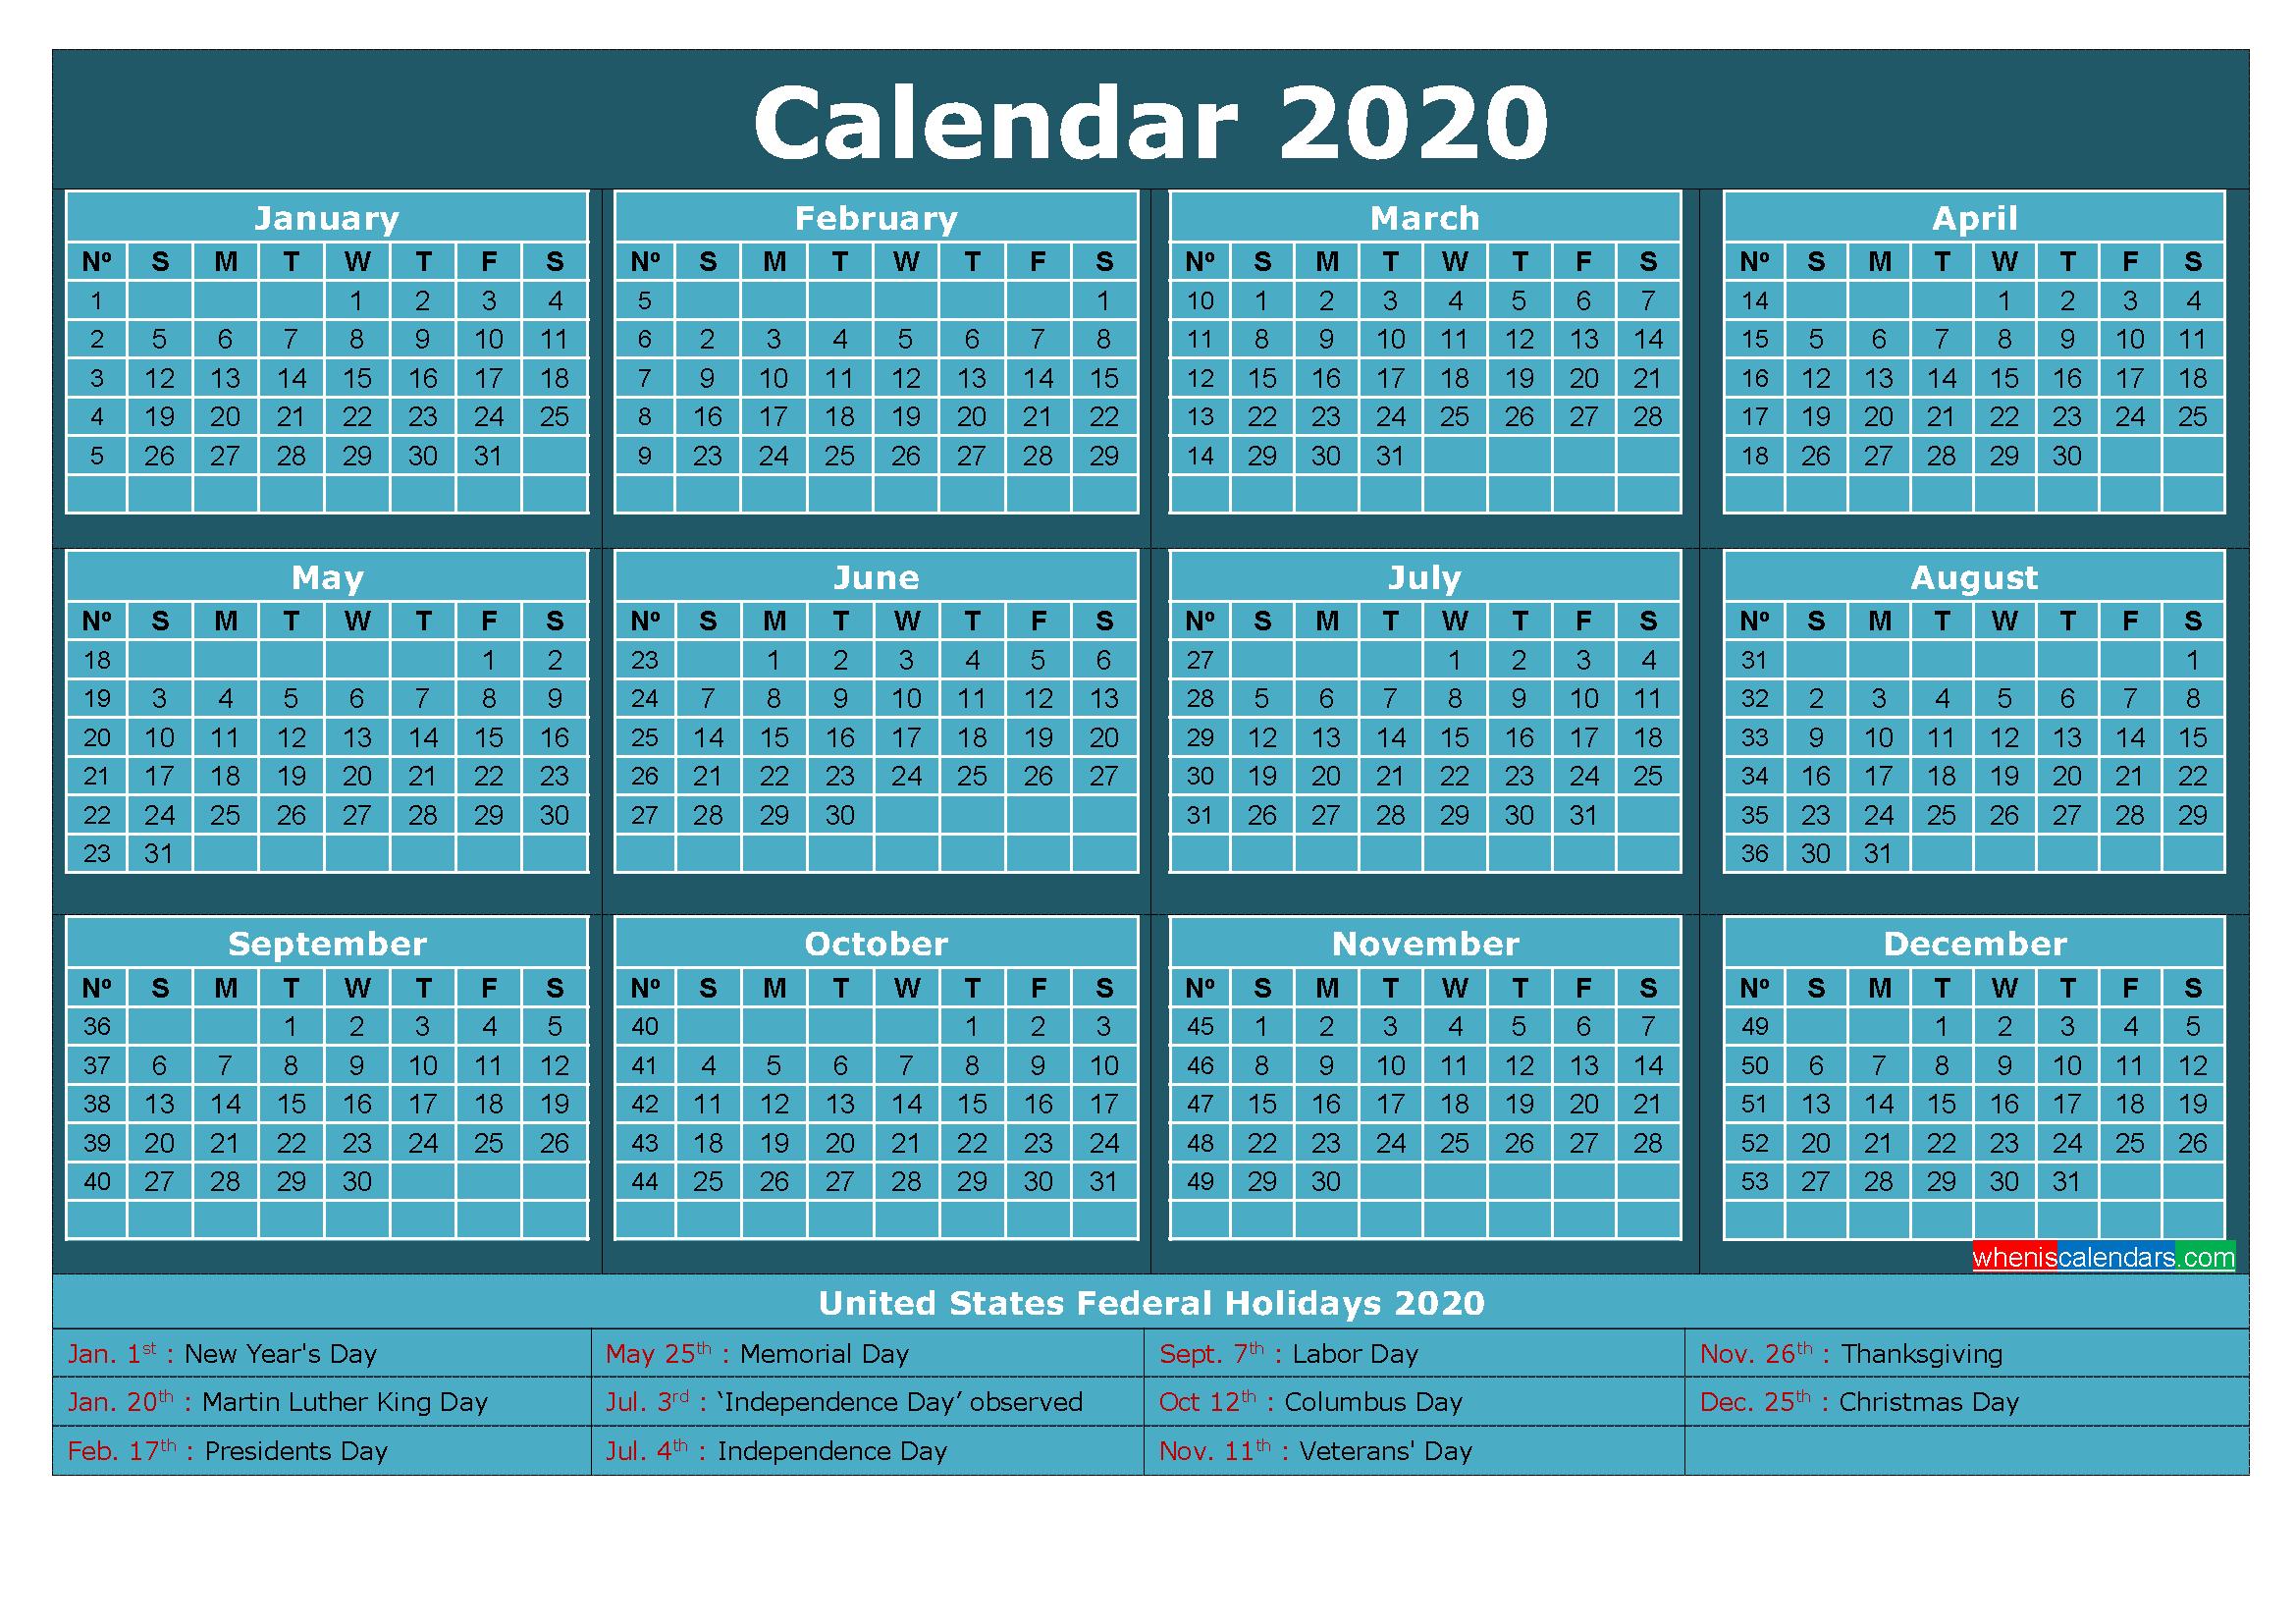 Free Printable Calendar with Holidays 2020 Word, PDF